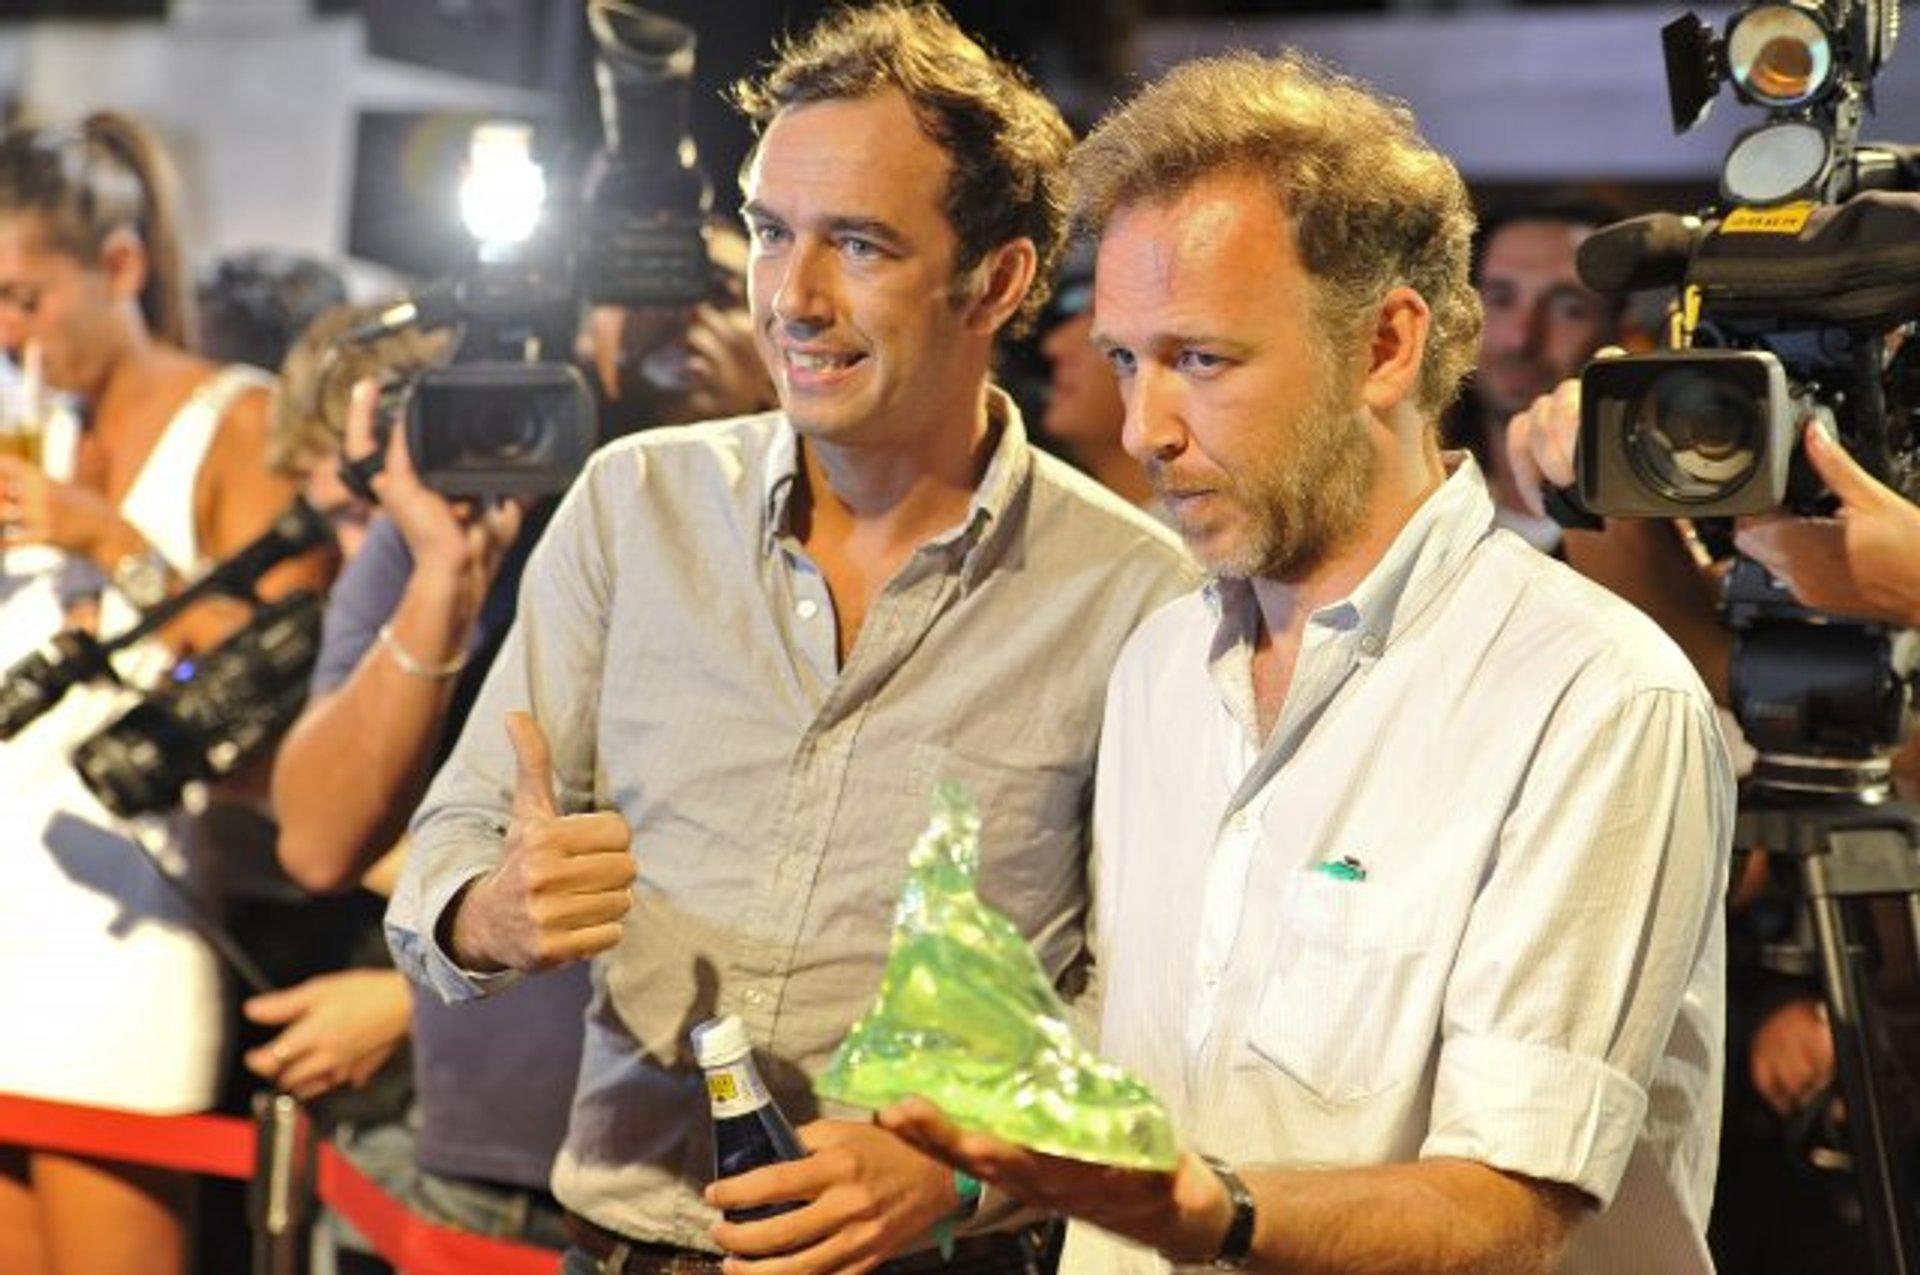 DJ Awards Ibiza in Ibiza - Best Season 2020